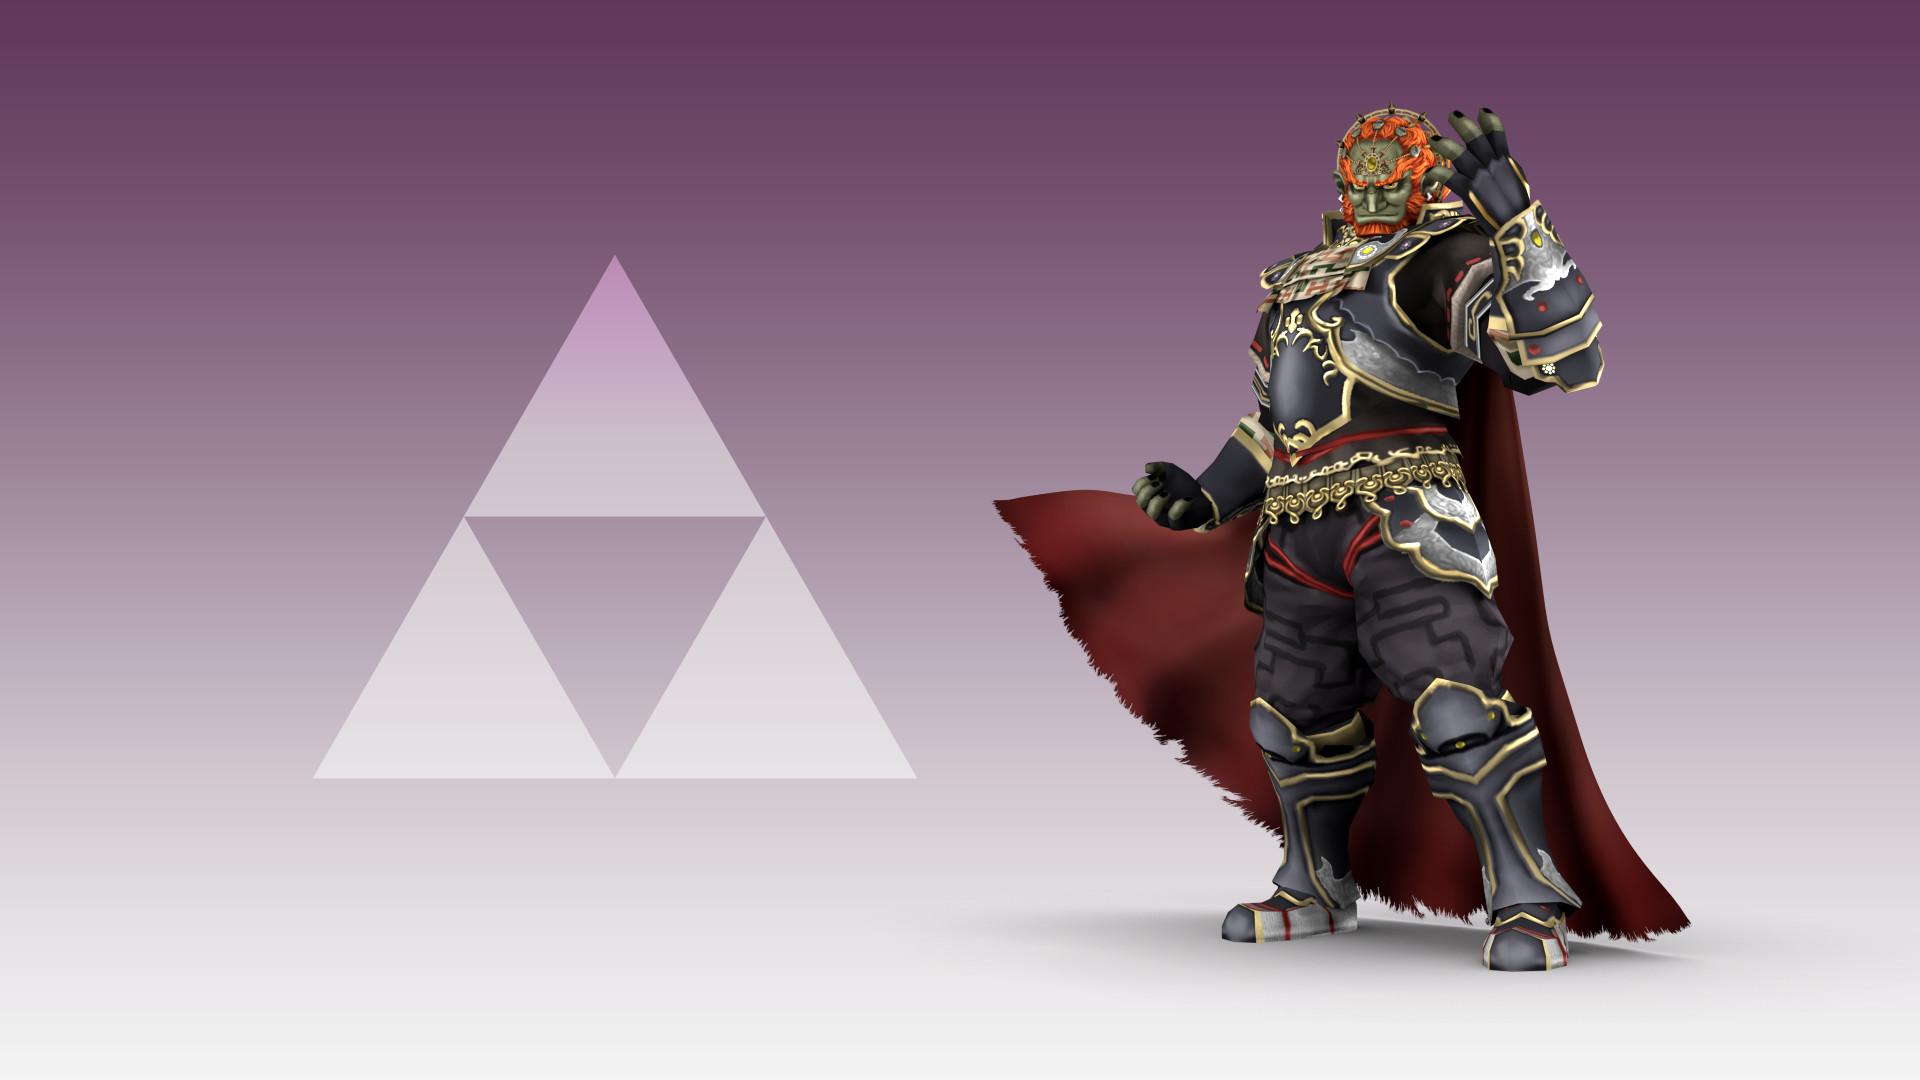 Ganondorf Wallpaper [Smash 3] by ryo-10pa on DeviantArt